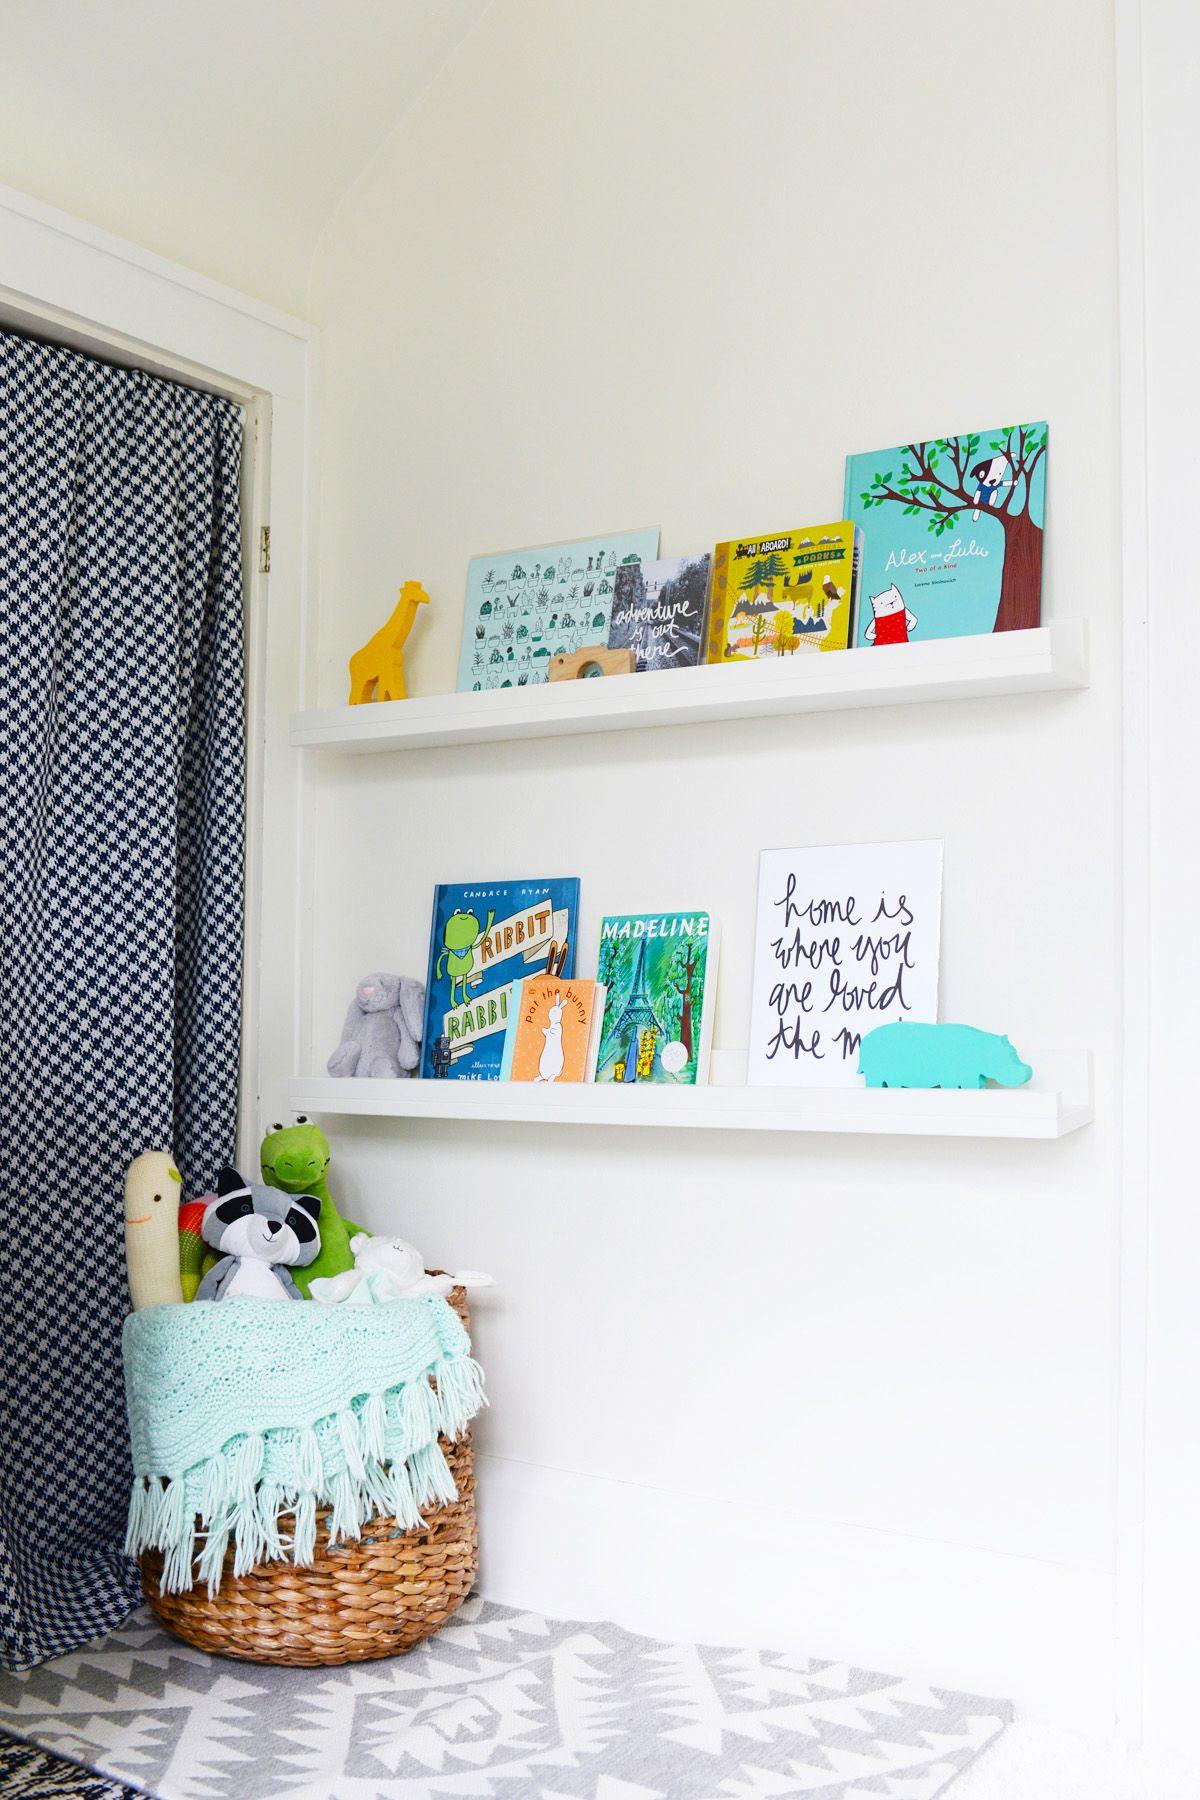 diy floating bookshelves white shelves for books display wall mounted wood shelving units hidden brackets entry hall coat hooks black crown molding shelf above kitchen cabinets